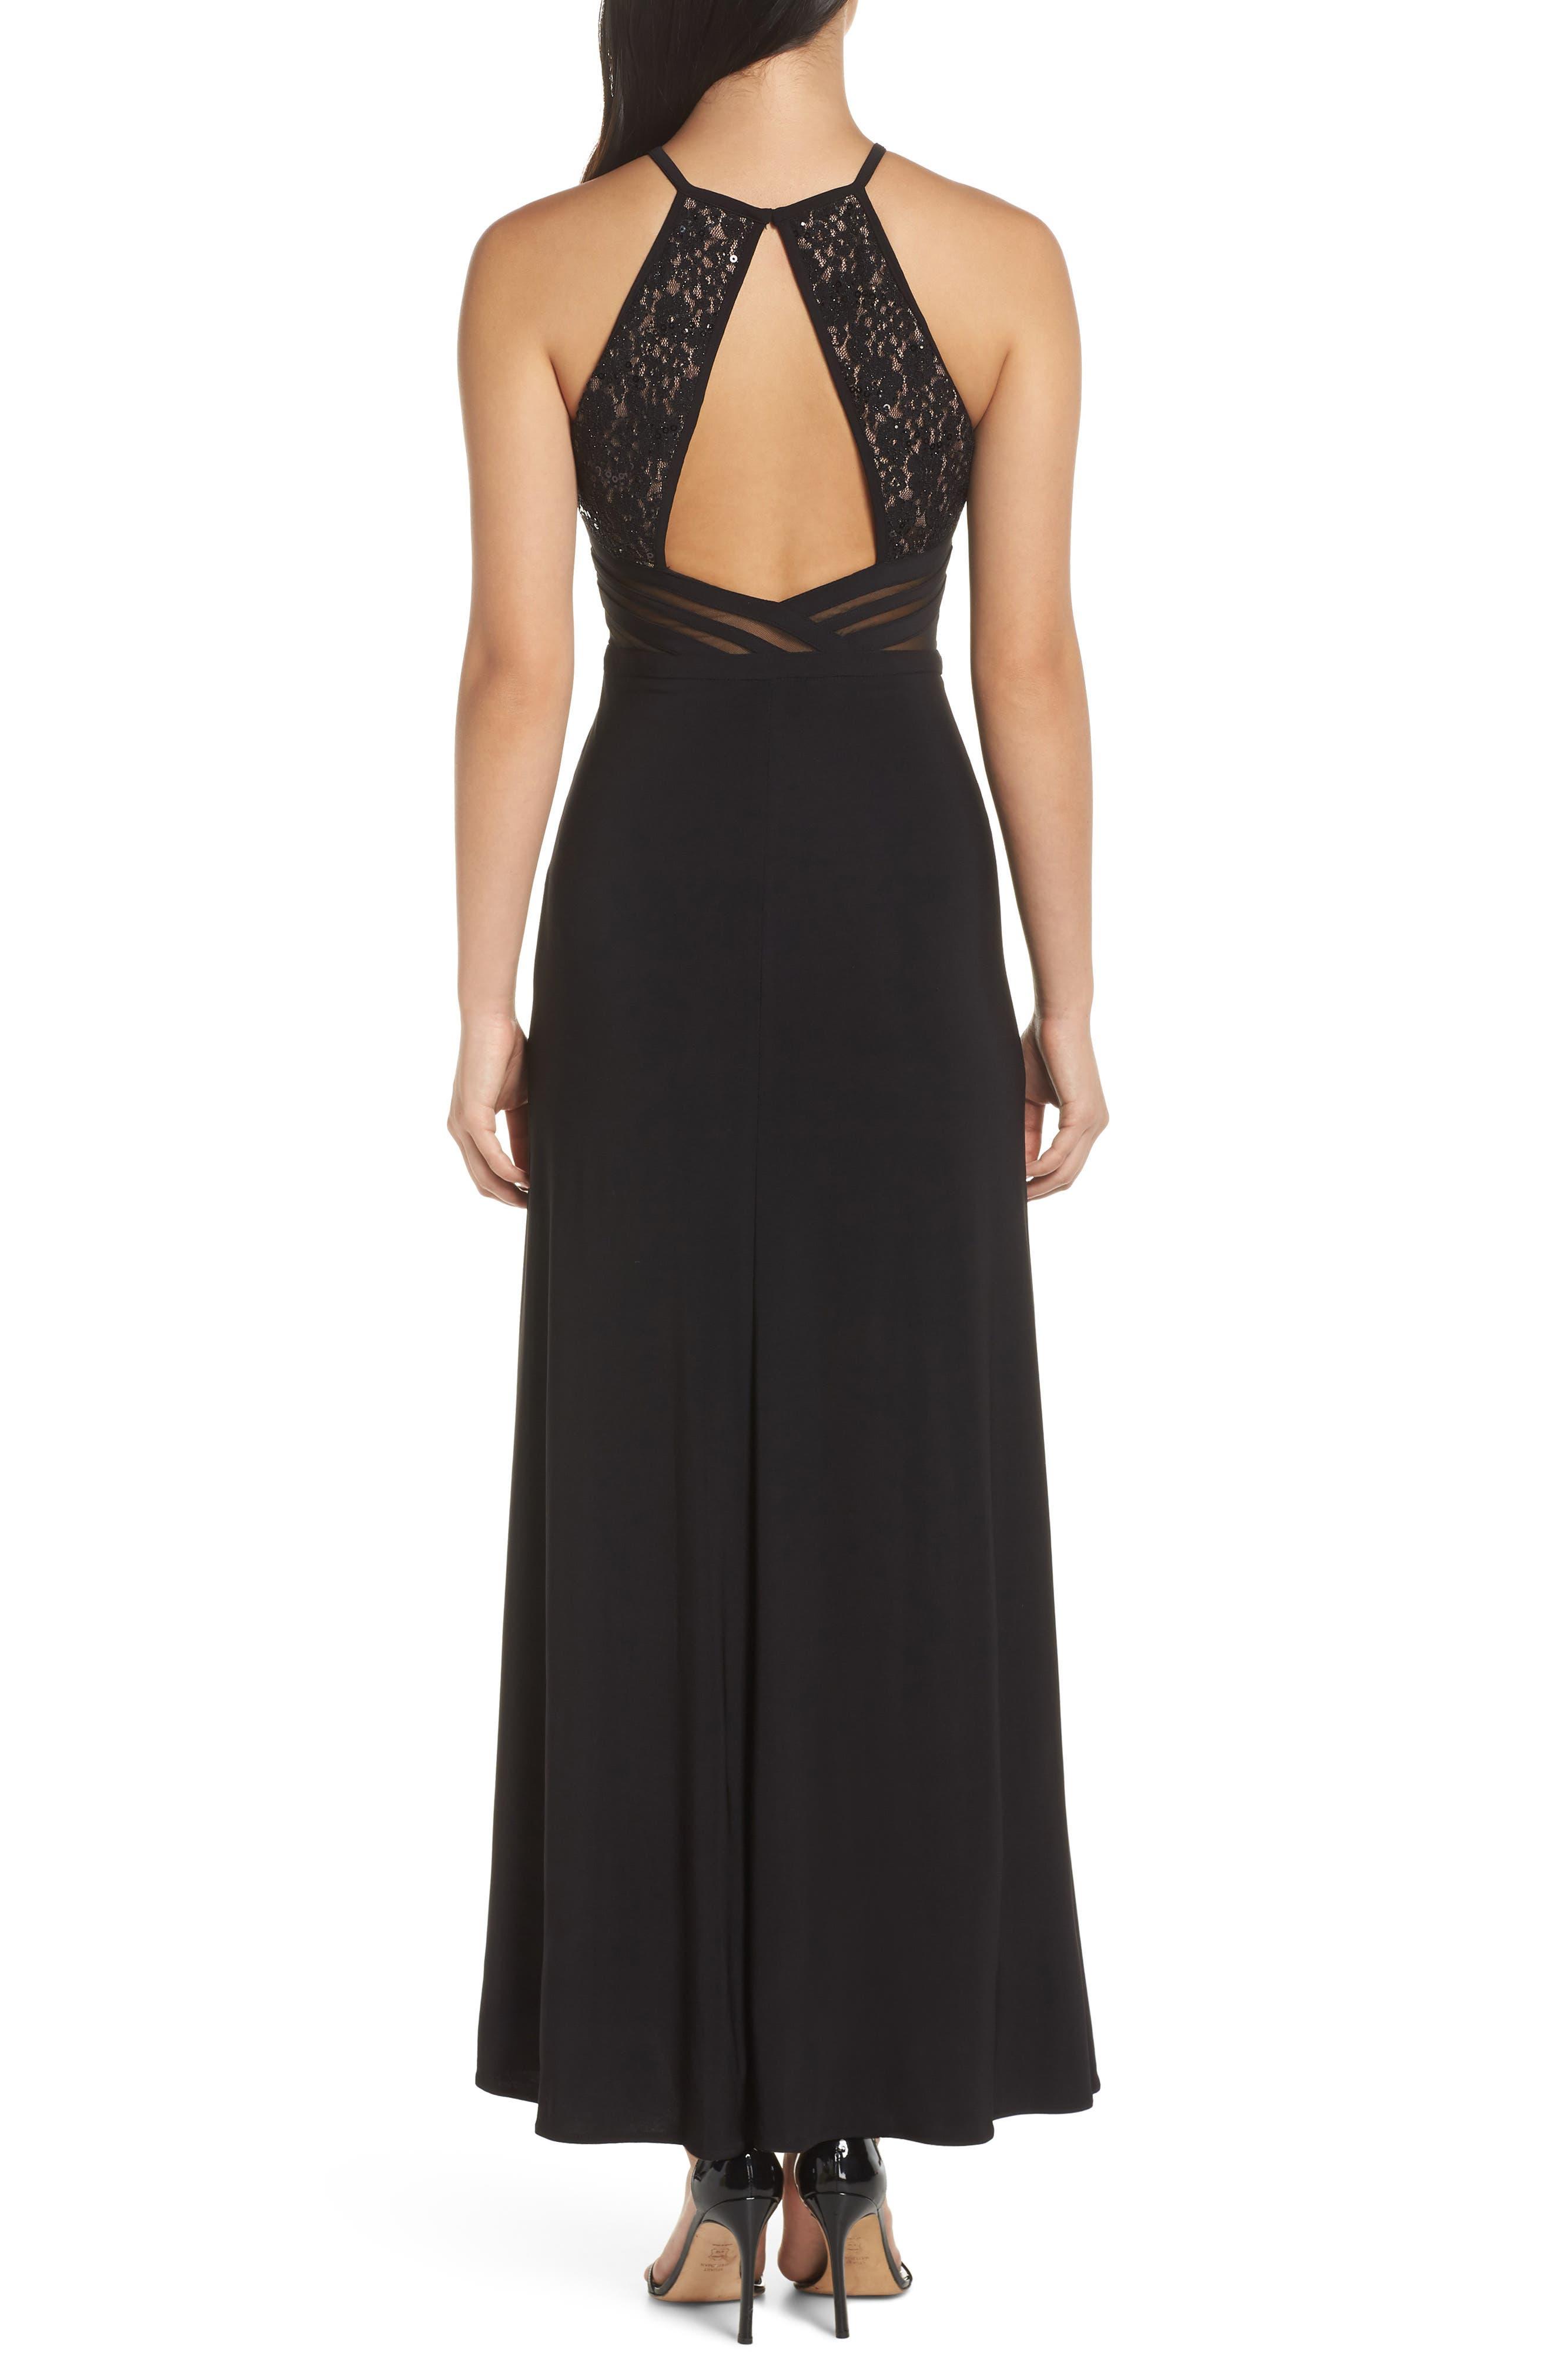 MORGAN & CO.,                             Lace & Illusion Mesh Bodice Gown,                             Alternate thumbnail 2, color,                             BLACK/ NUDE